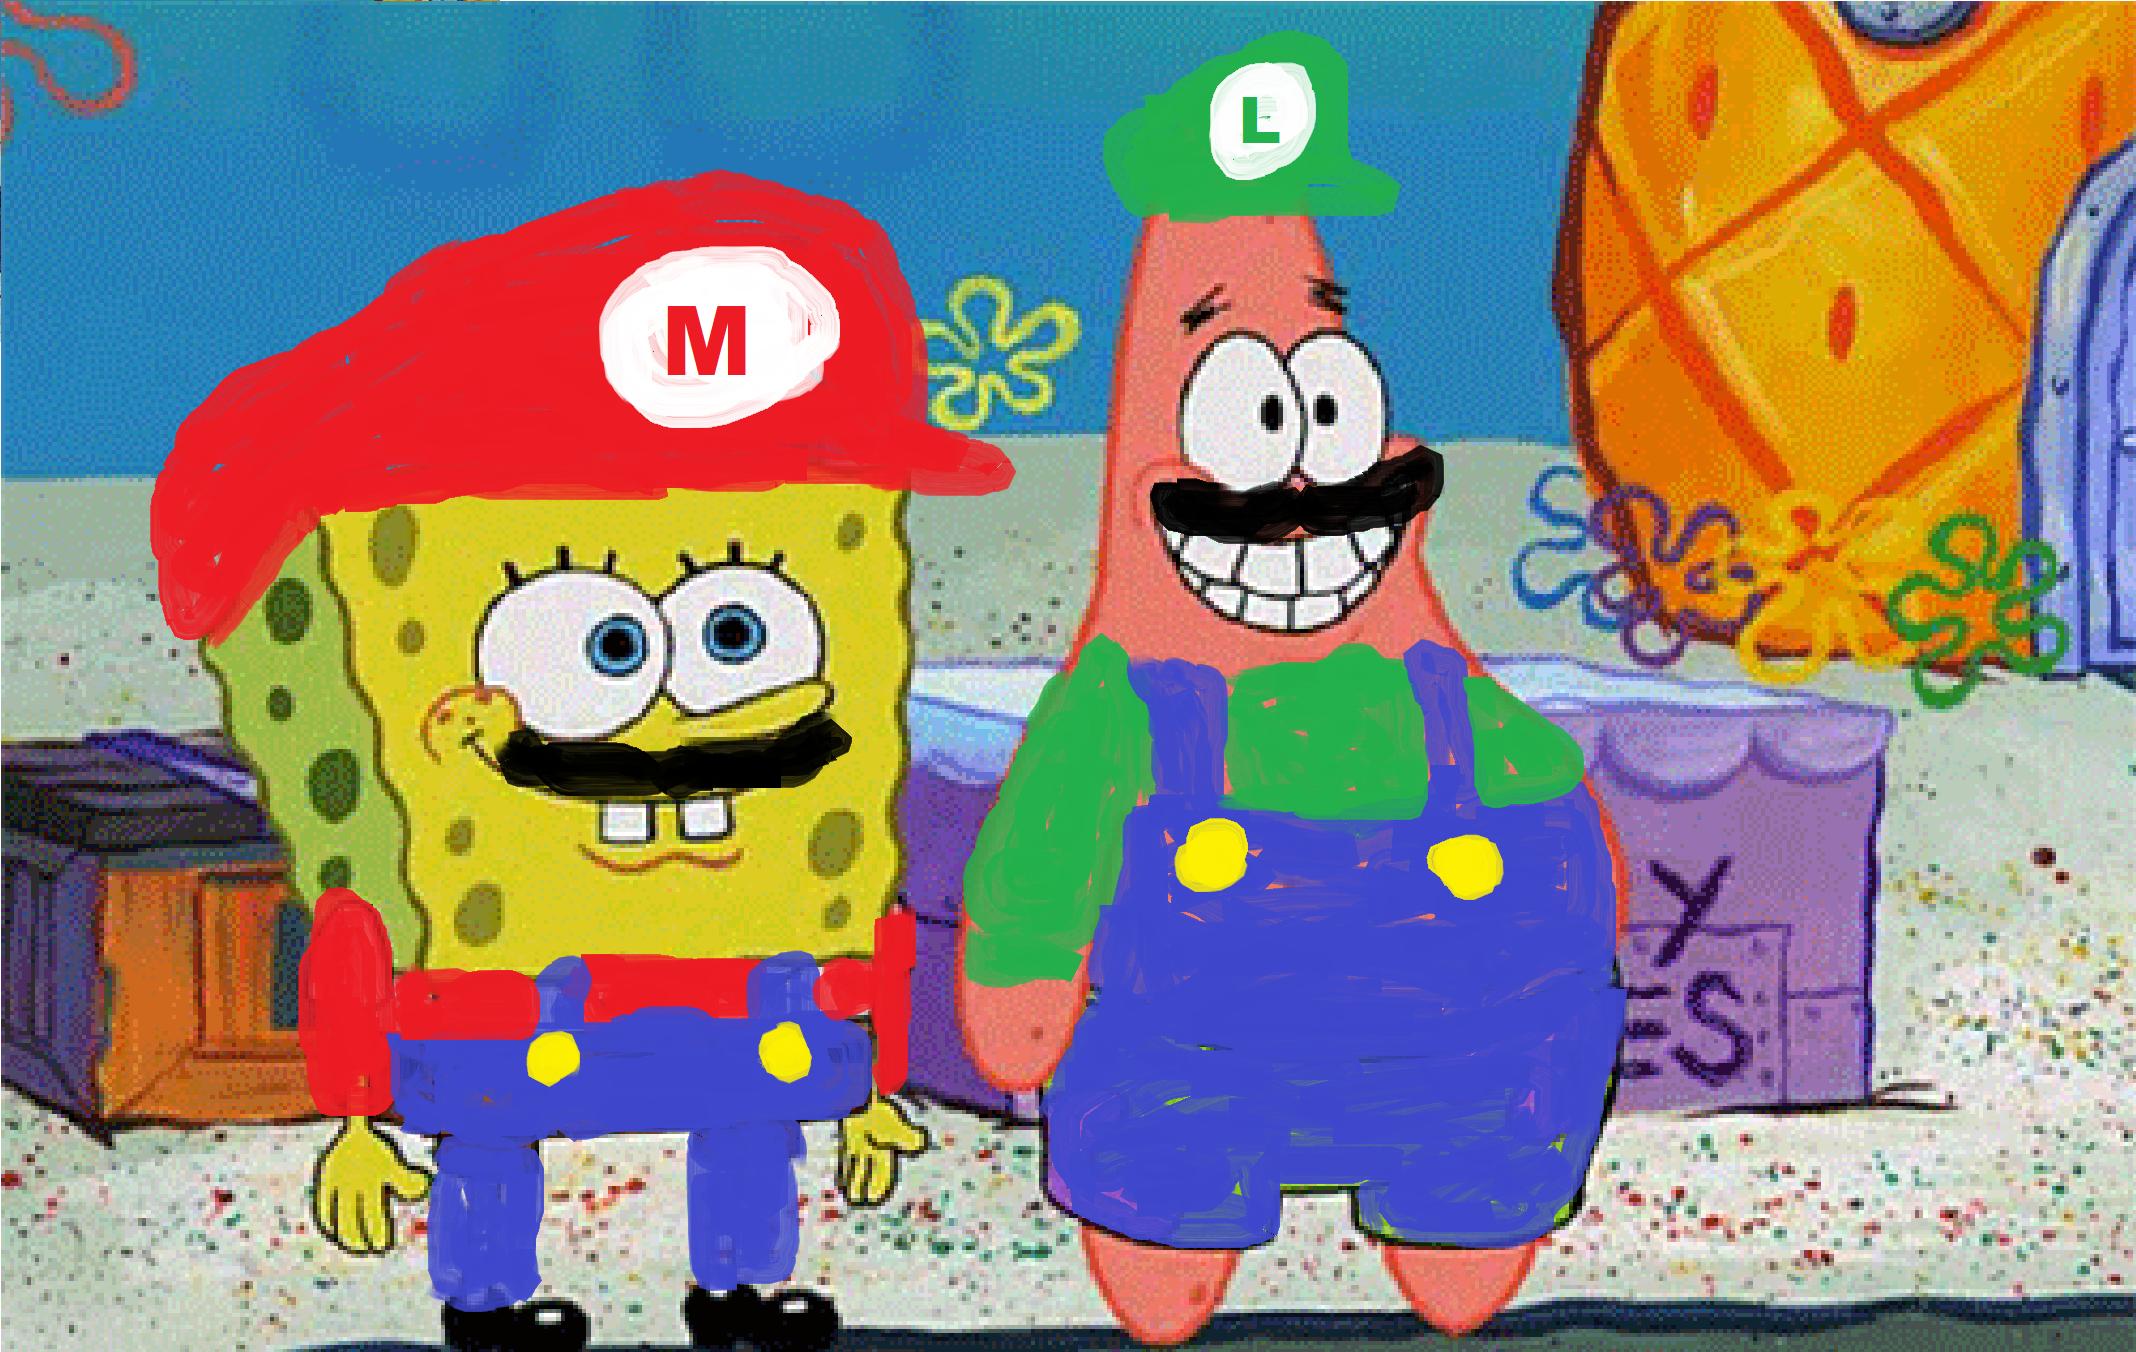 Spongebob And Patrick As Mario And Luigi By Brandonale On Deviantart